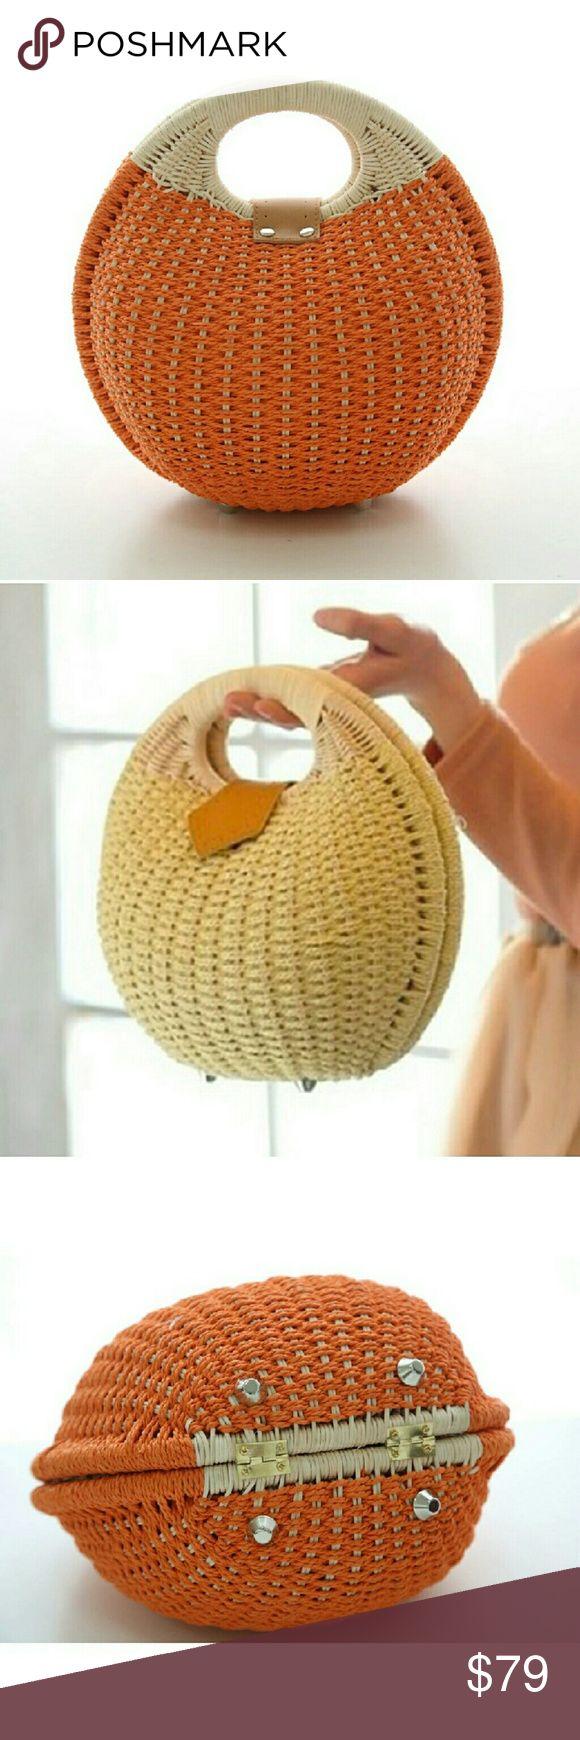 Bogo Rattan Women Snail's Hand BAG Beach tote Bogo RATTAN Snail handbag tote 3DAY SALE Bags Totes